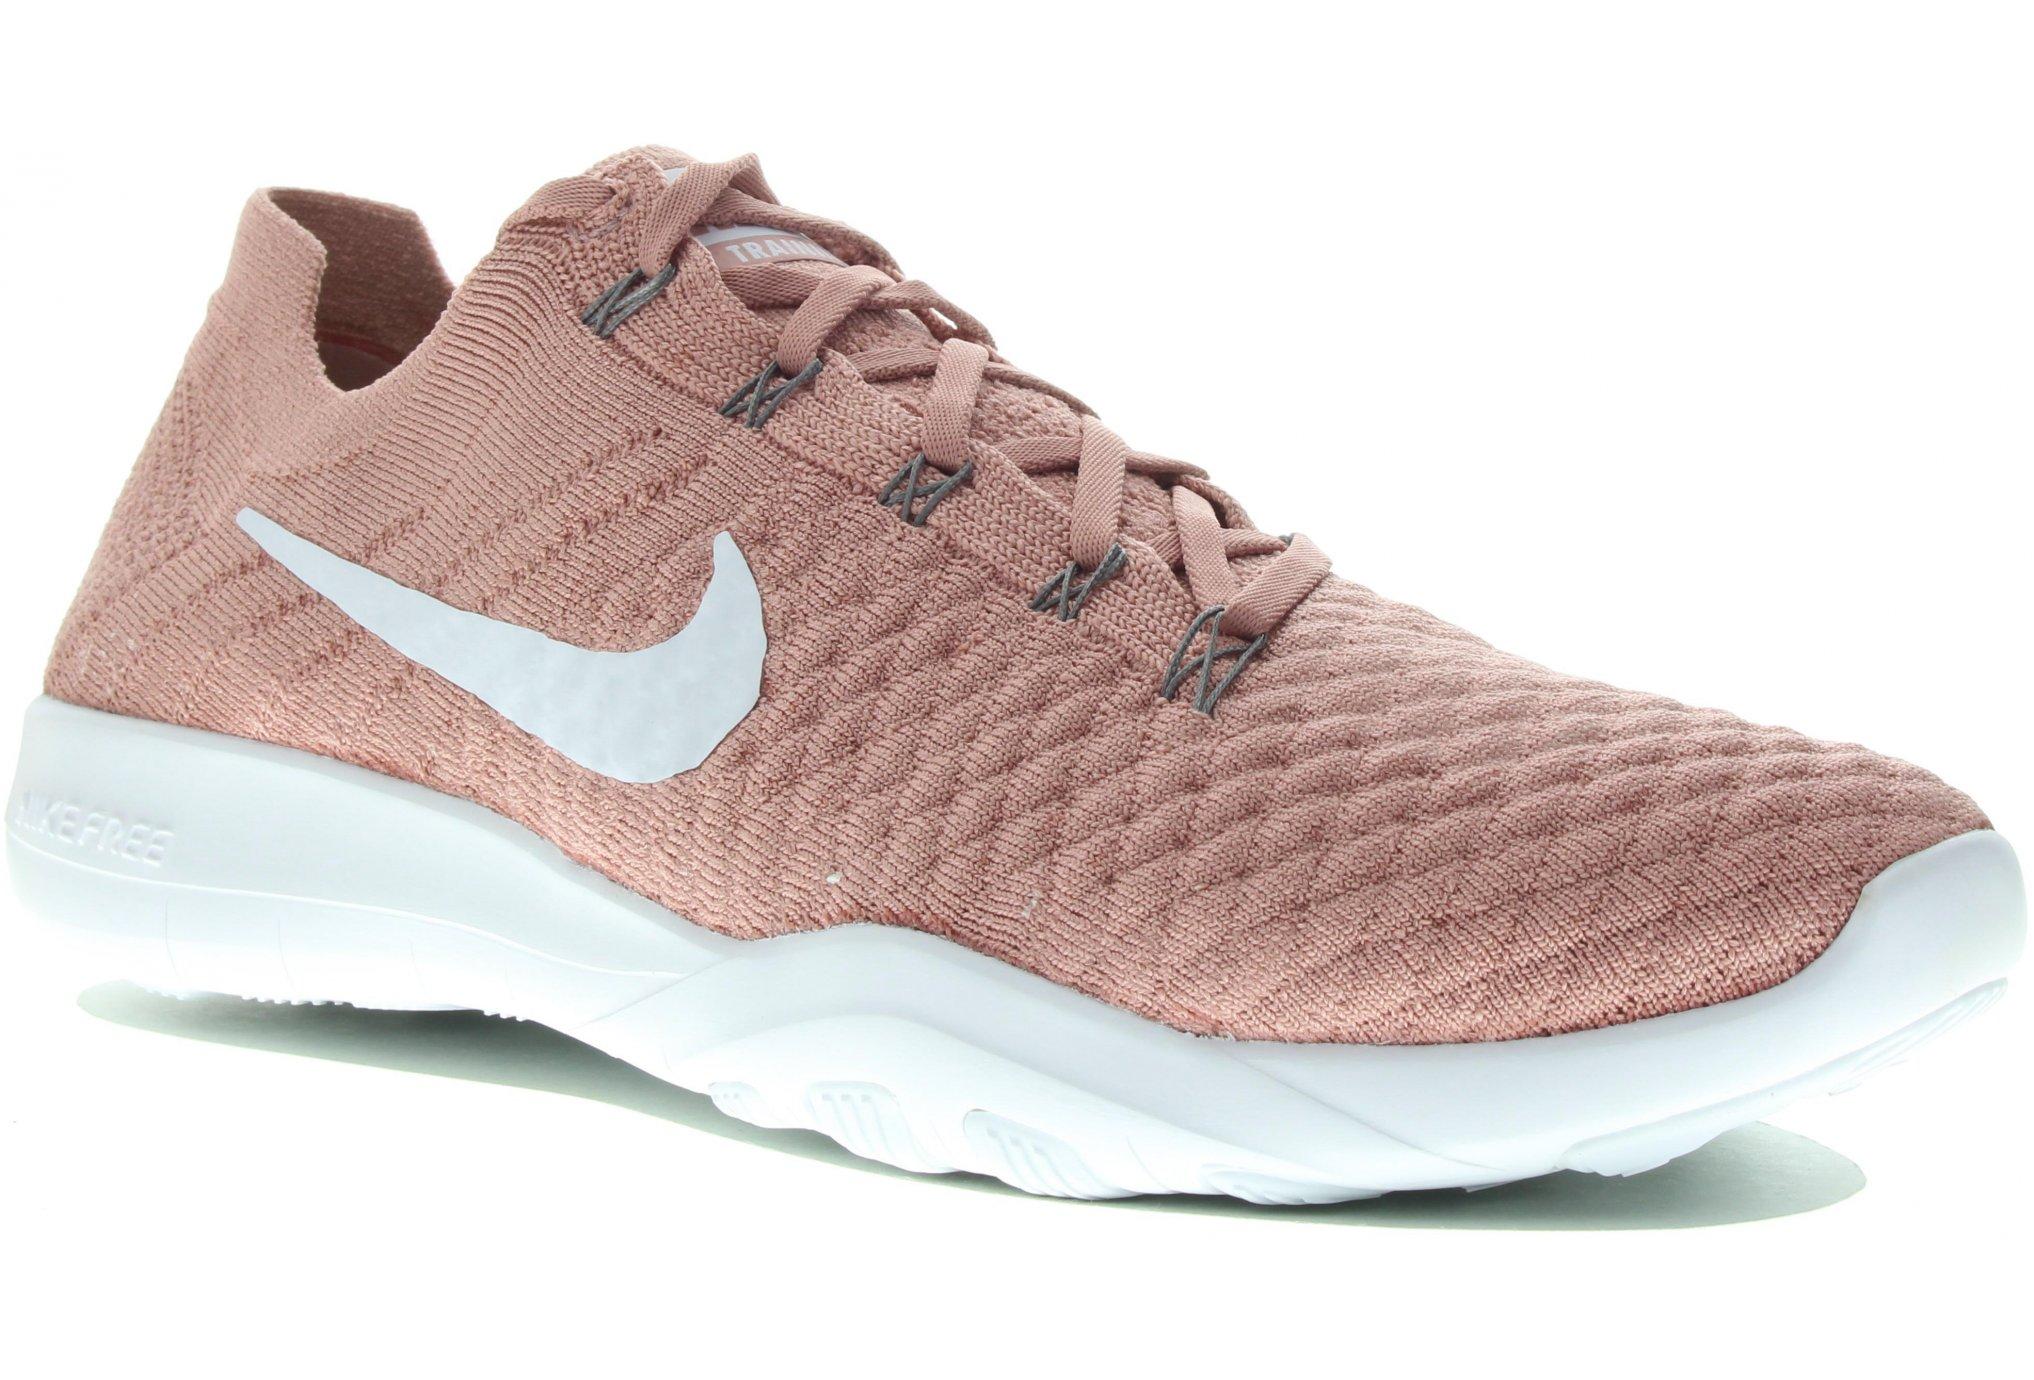 Nike Free TR Flyknit 2 W Diététique Chaussures femme